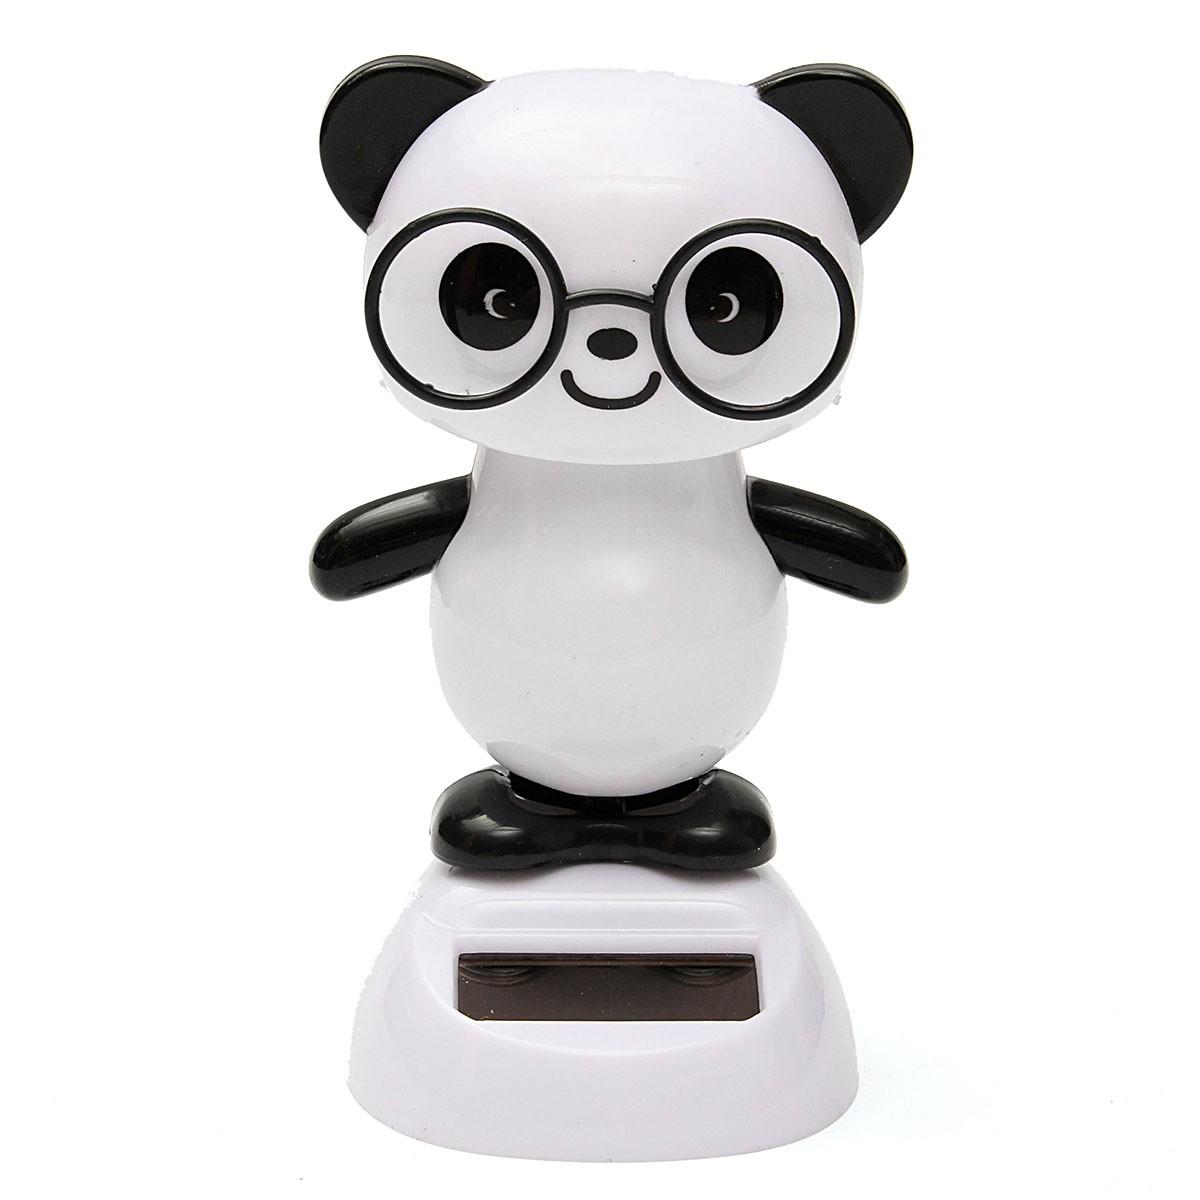 Solar Powered Dancing Flip Flap Car Home Desk Dancer Bobble Toy Flower Animal Bear Panda Shape Decoration Gadgets(China (Mainland))